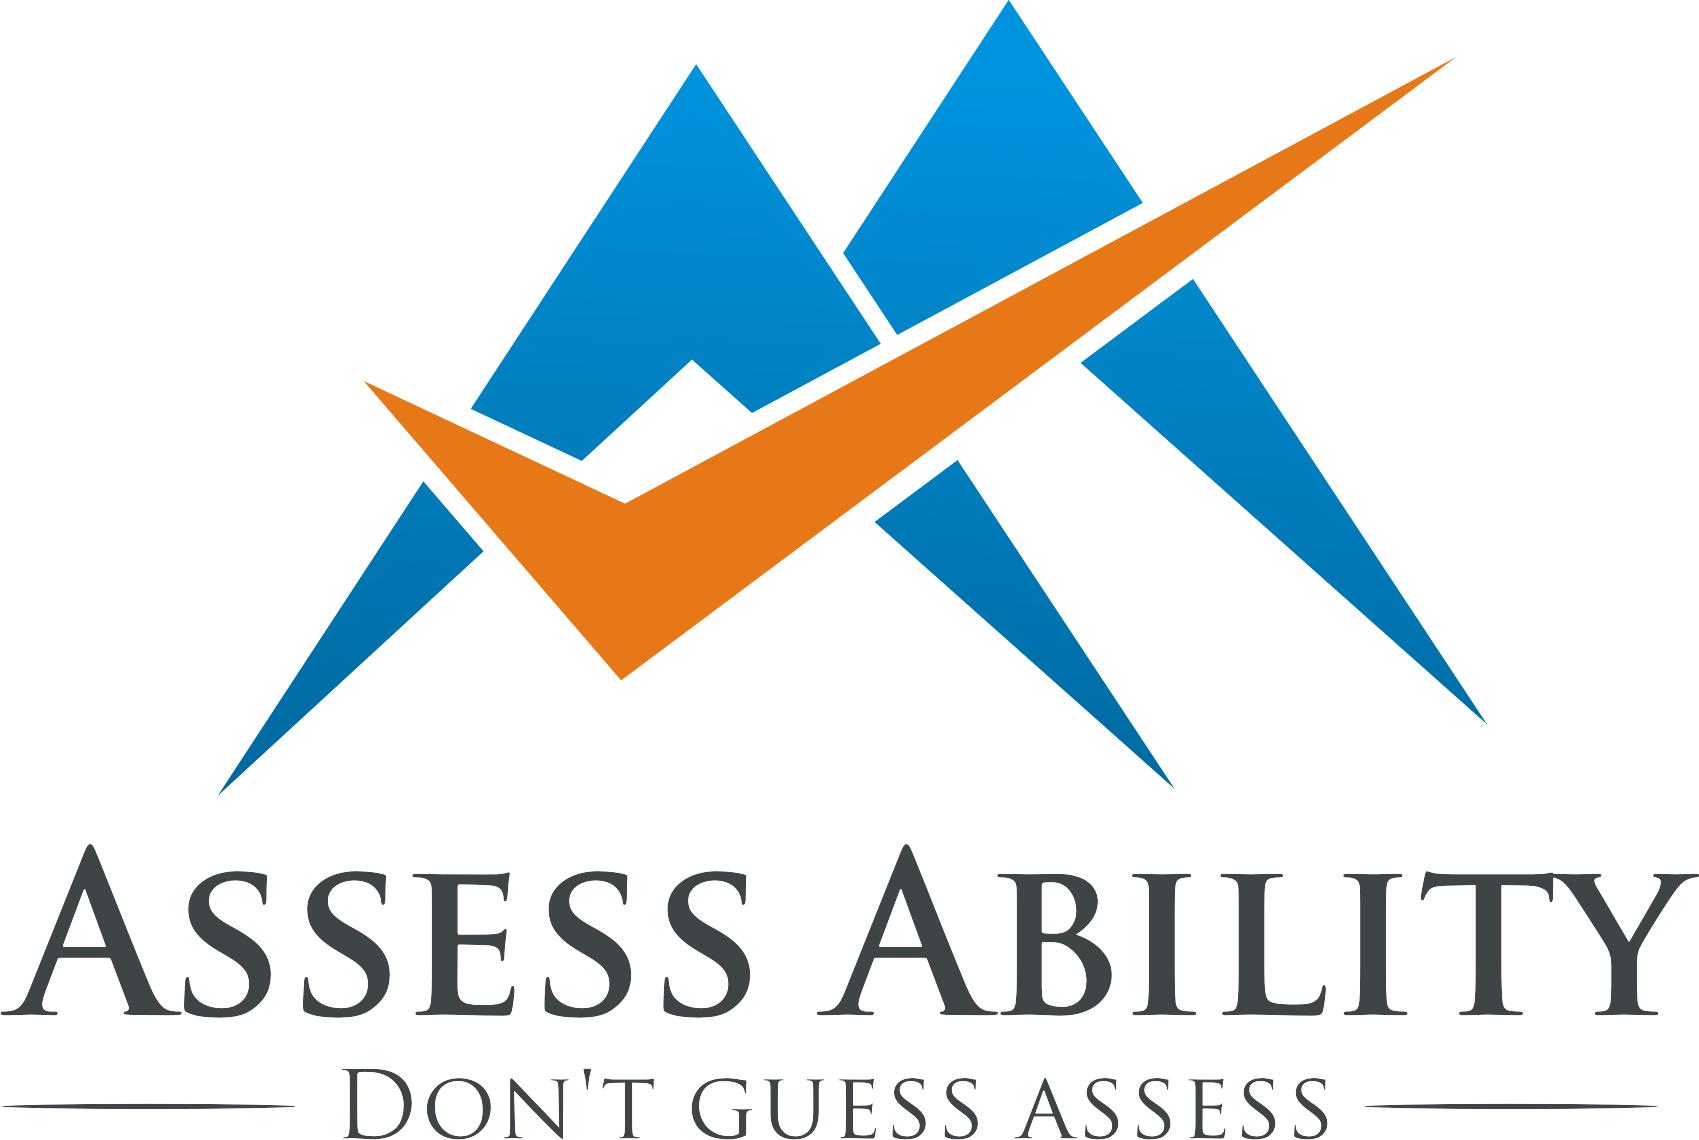 Assess Ability